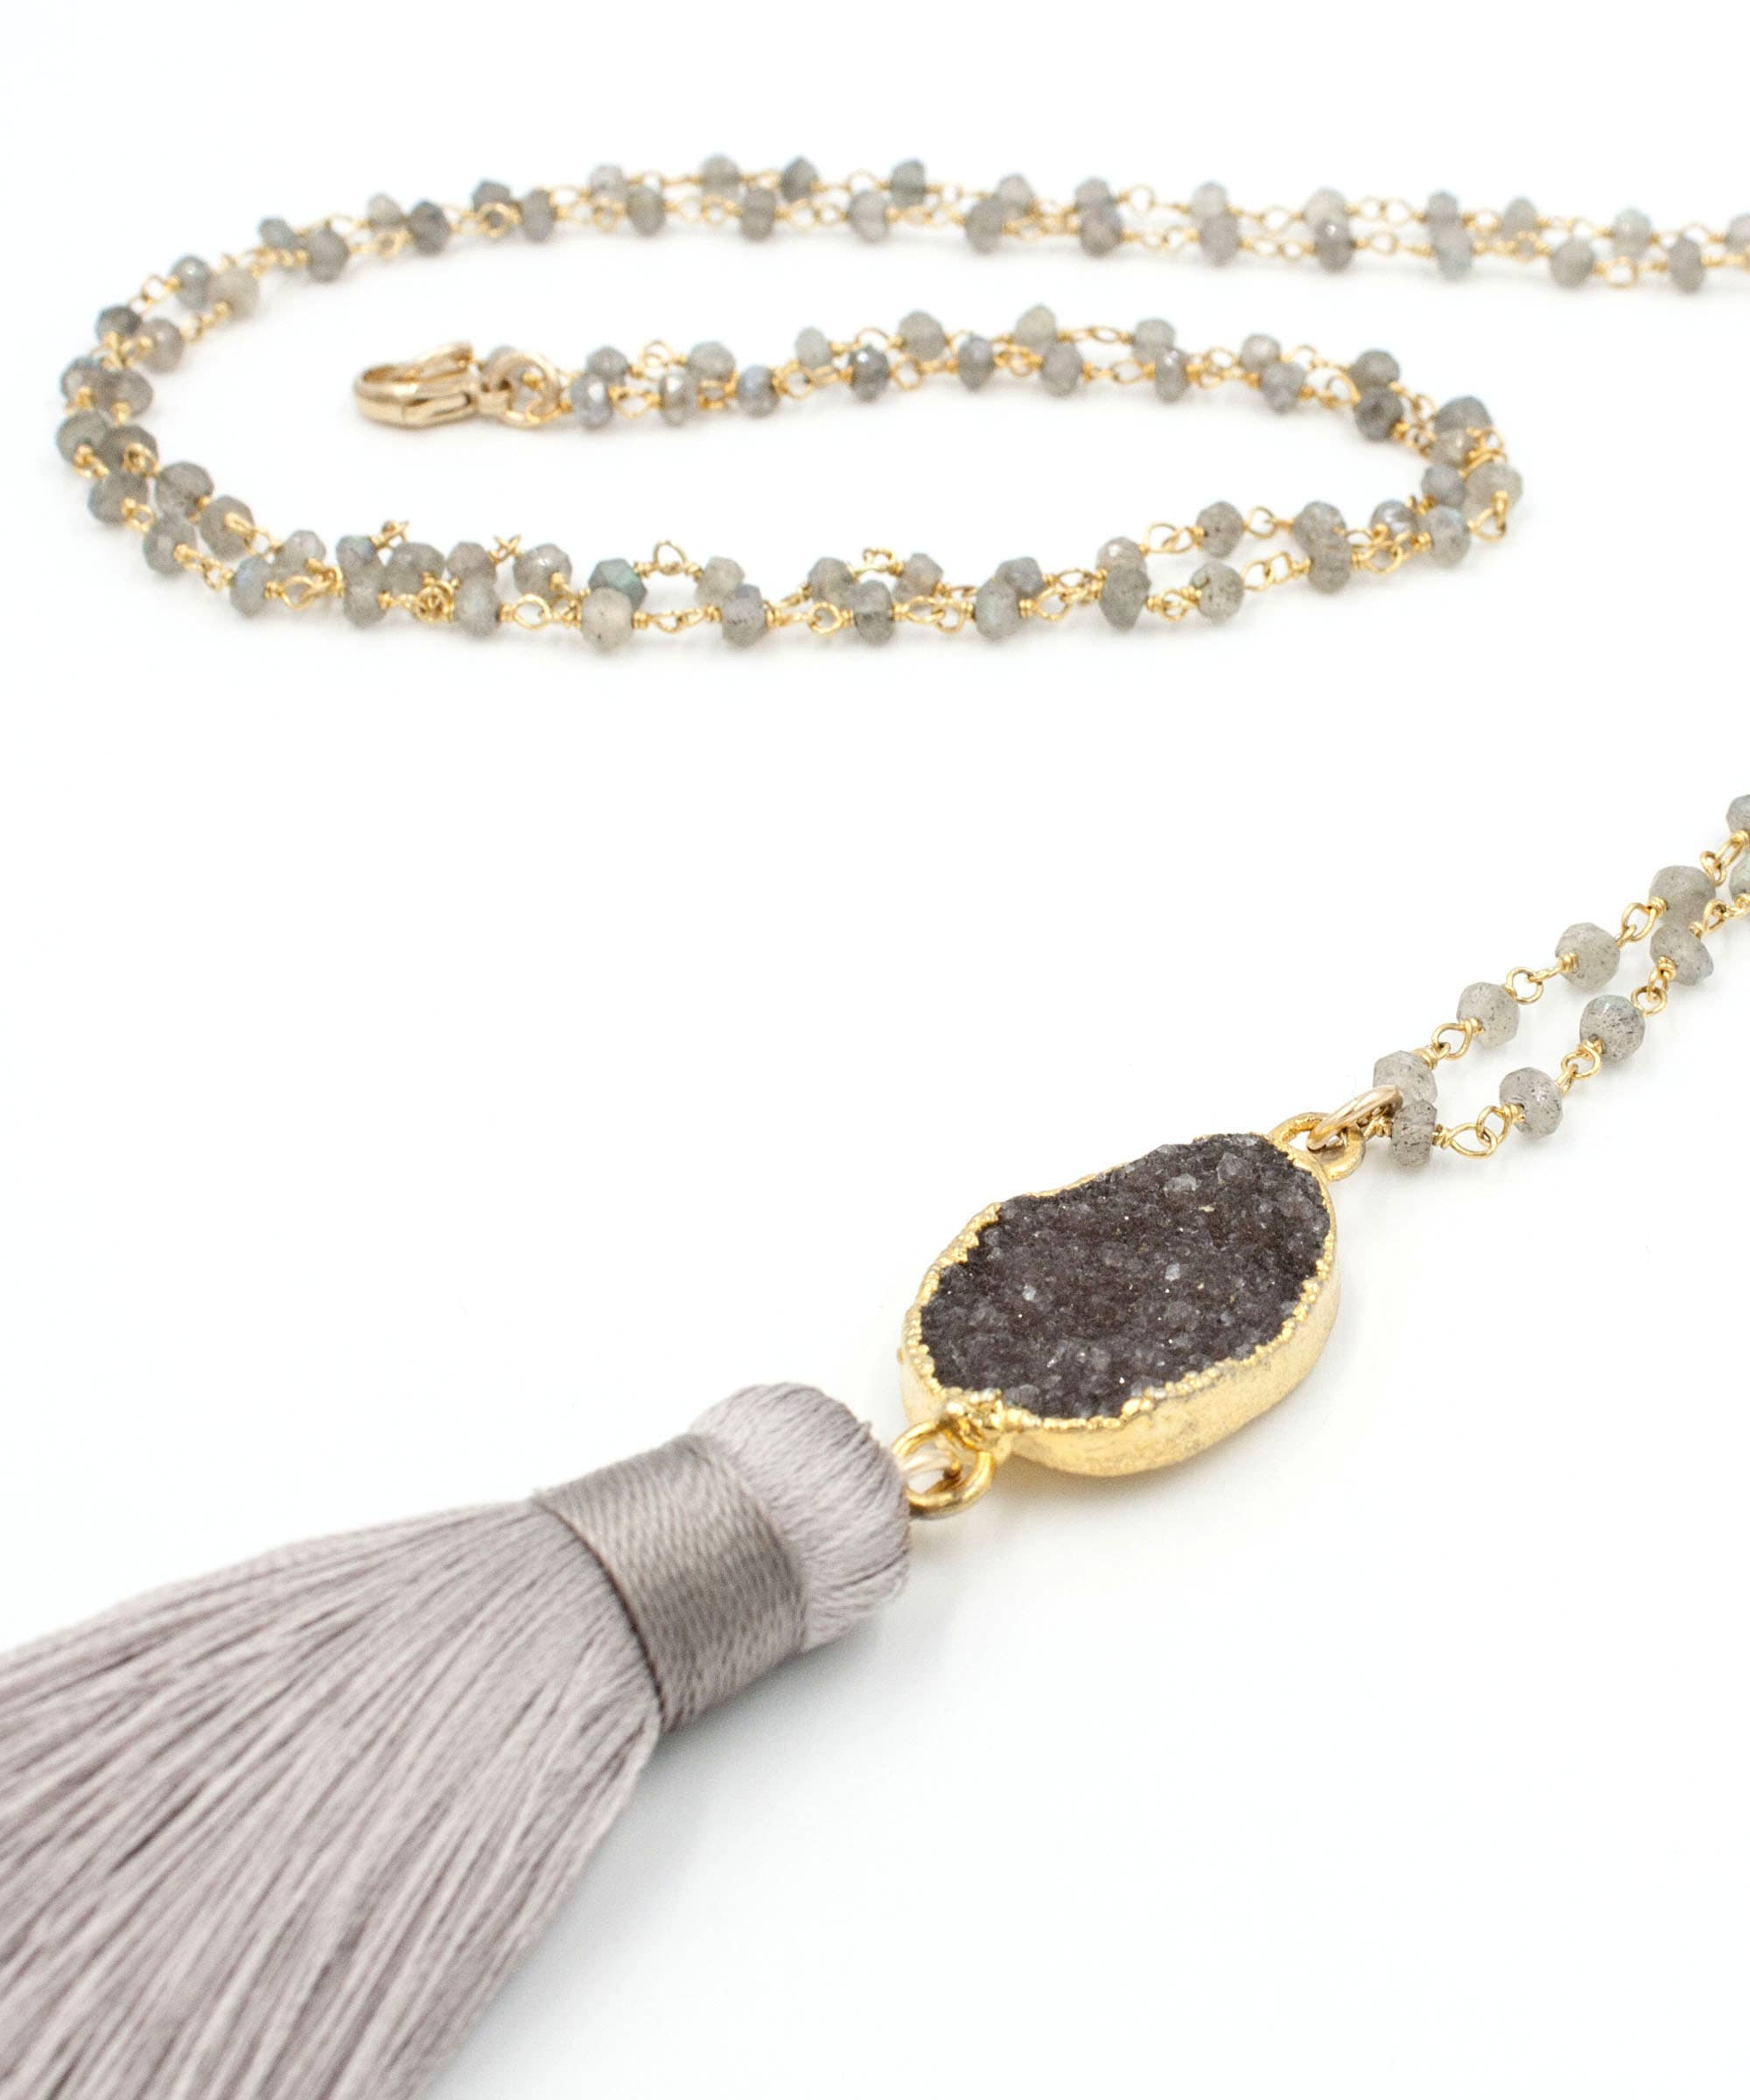 Marquis Druzy Pendant Necklace Zara Druzy Y Necklace Short Druzy Necklace Gift for Her Delicate Labradorite Rosary Chain